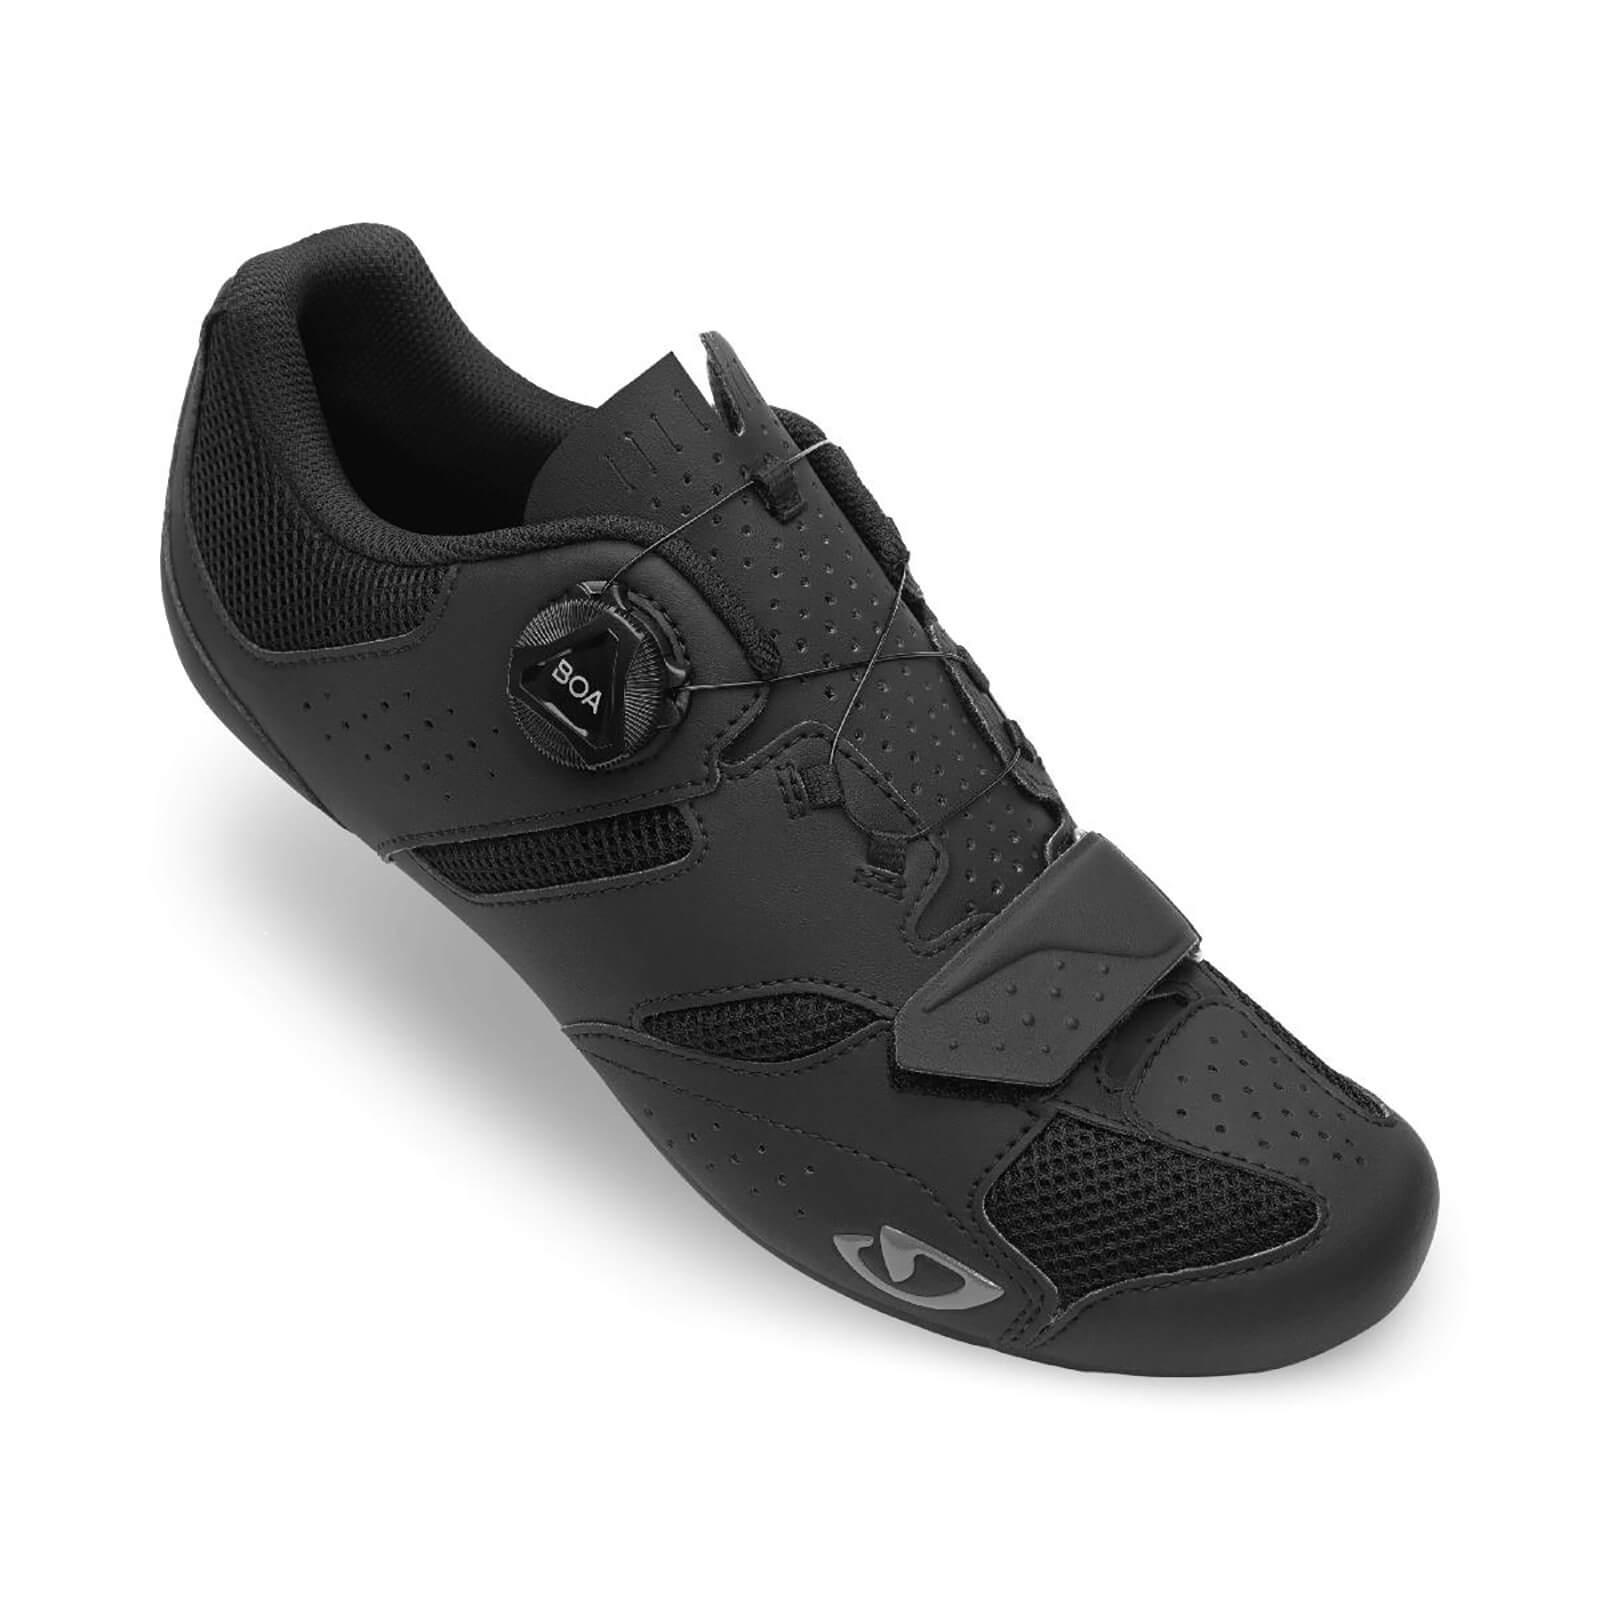 Giro Savix II Road Shoe - EU 48 - Black